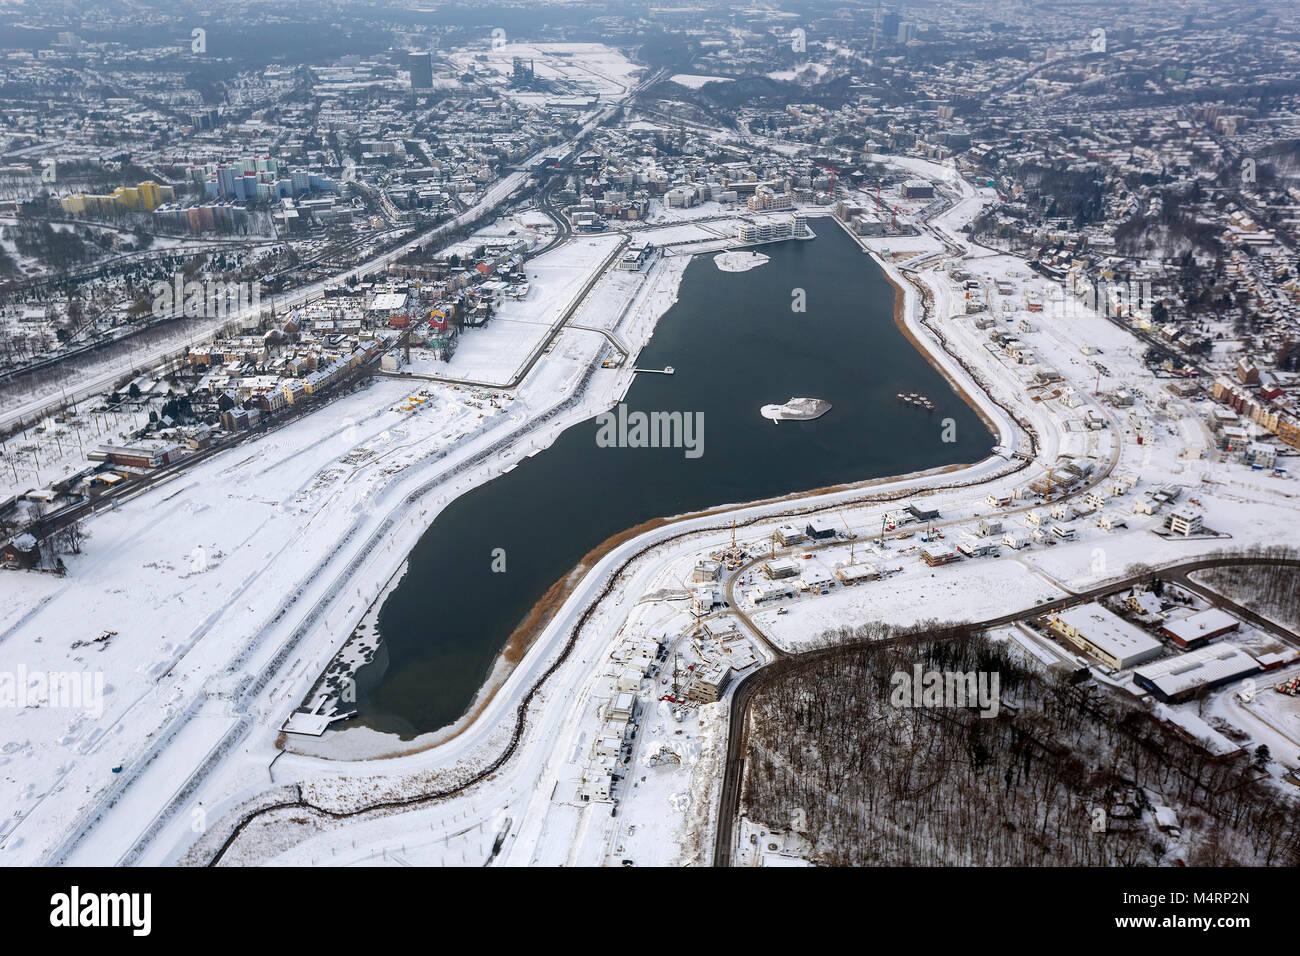 Aerial view, Emscher, residential development on the lake, lake island, Phoenixsee, former steelwork Dortmund Hörde, - Stock Image